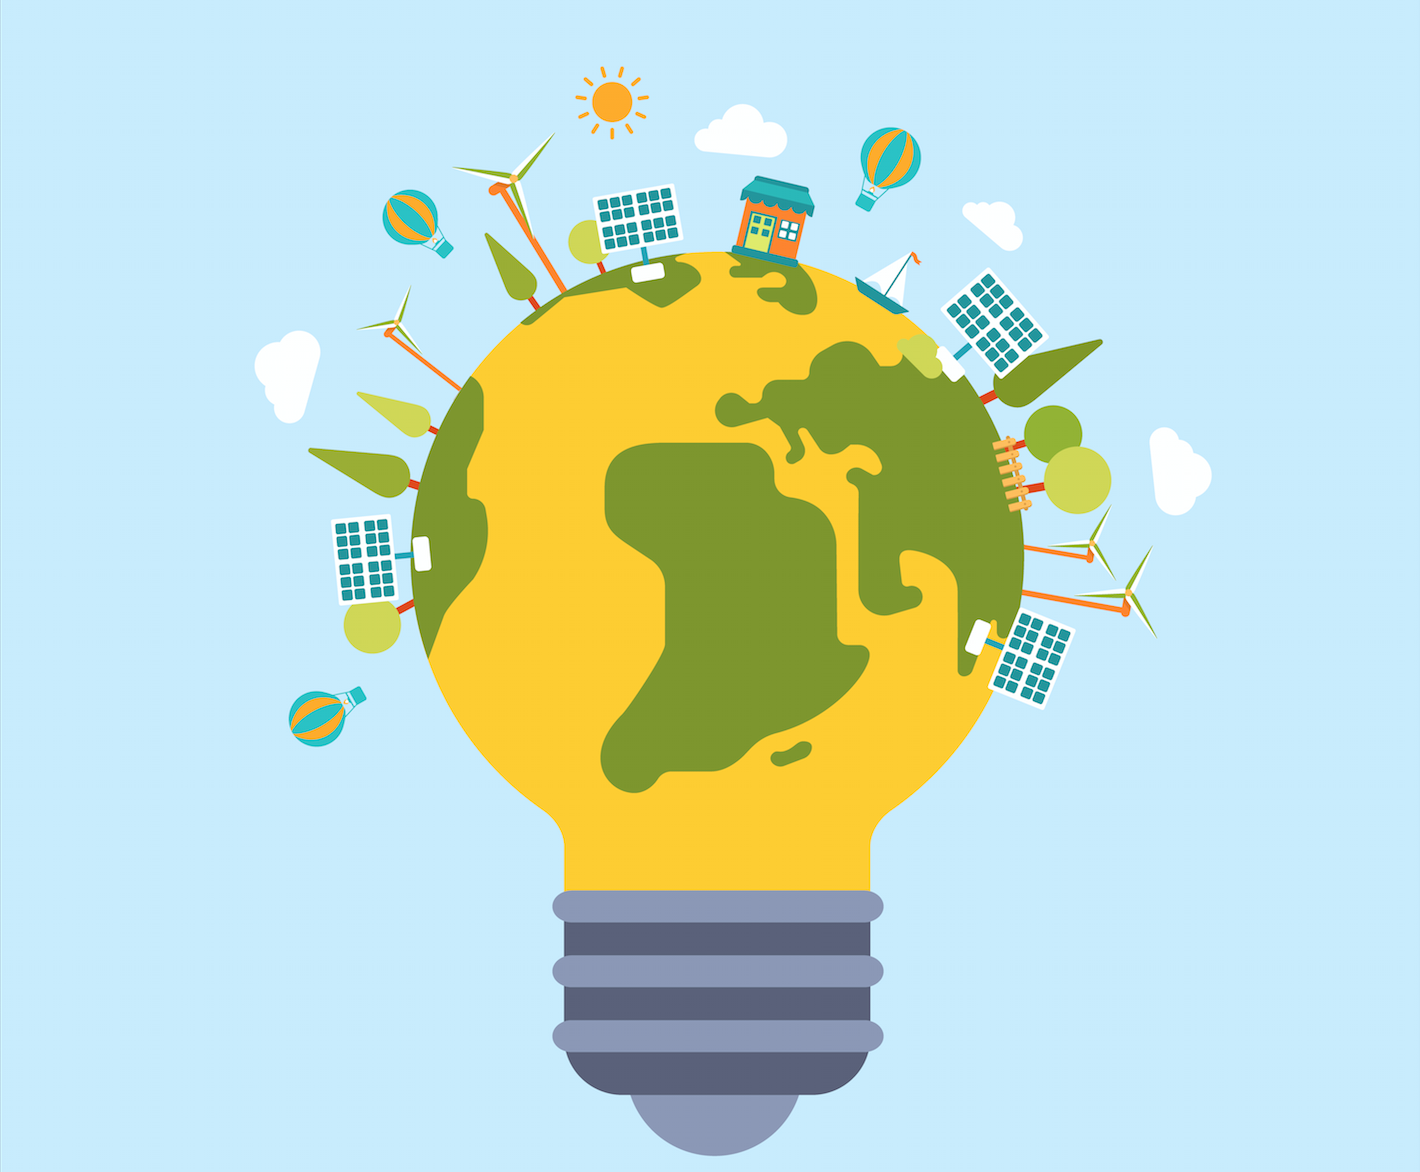 rew_globalrenewableenergyisstatuspositive